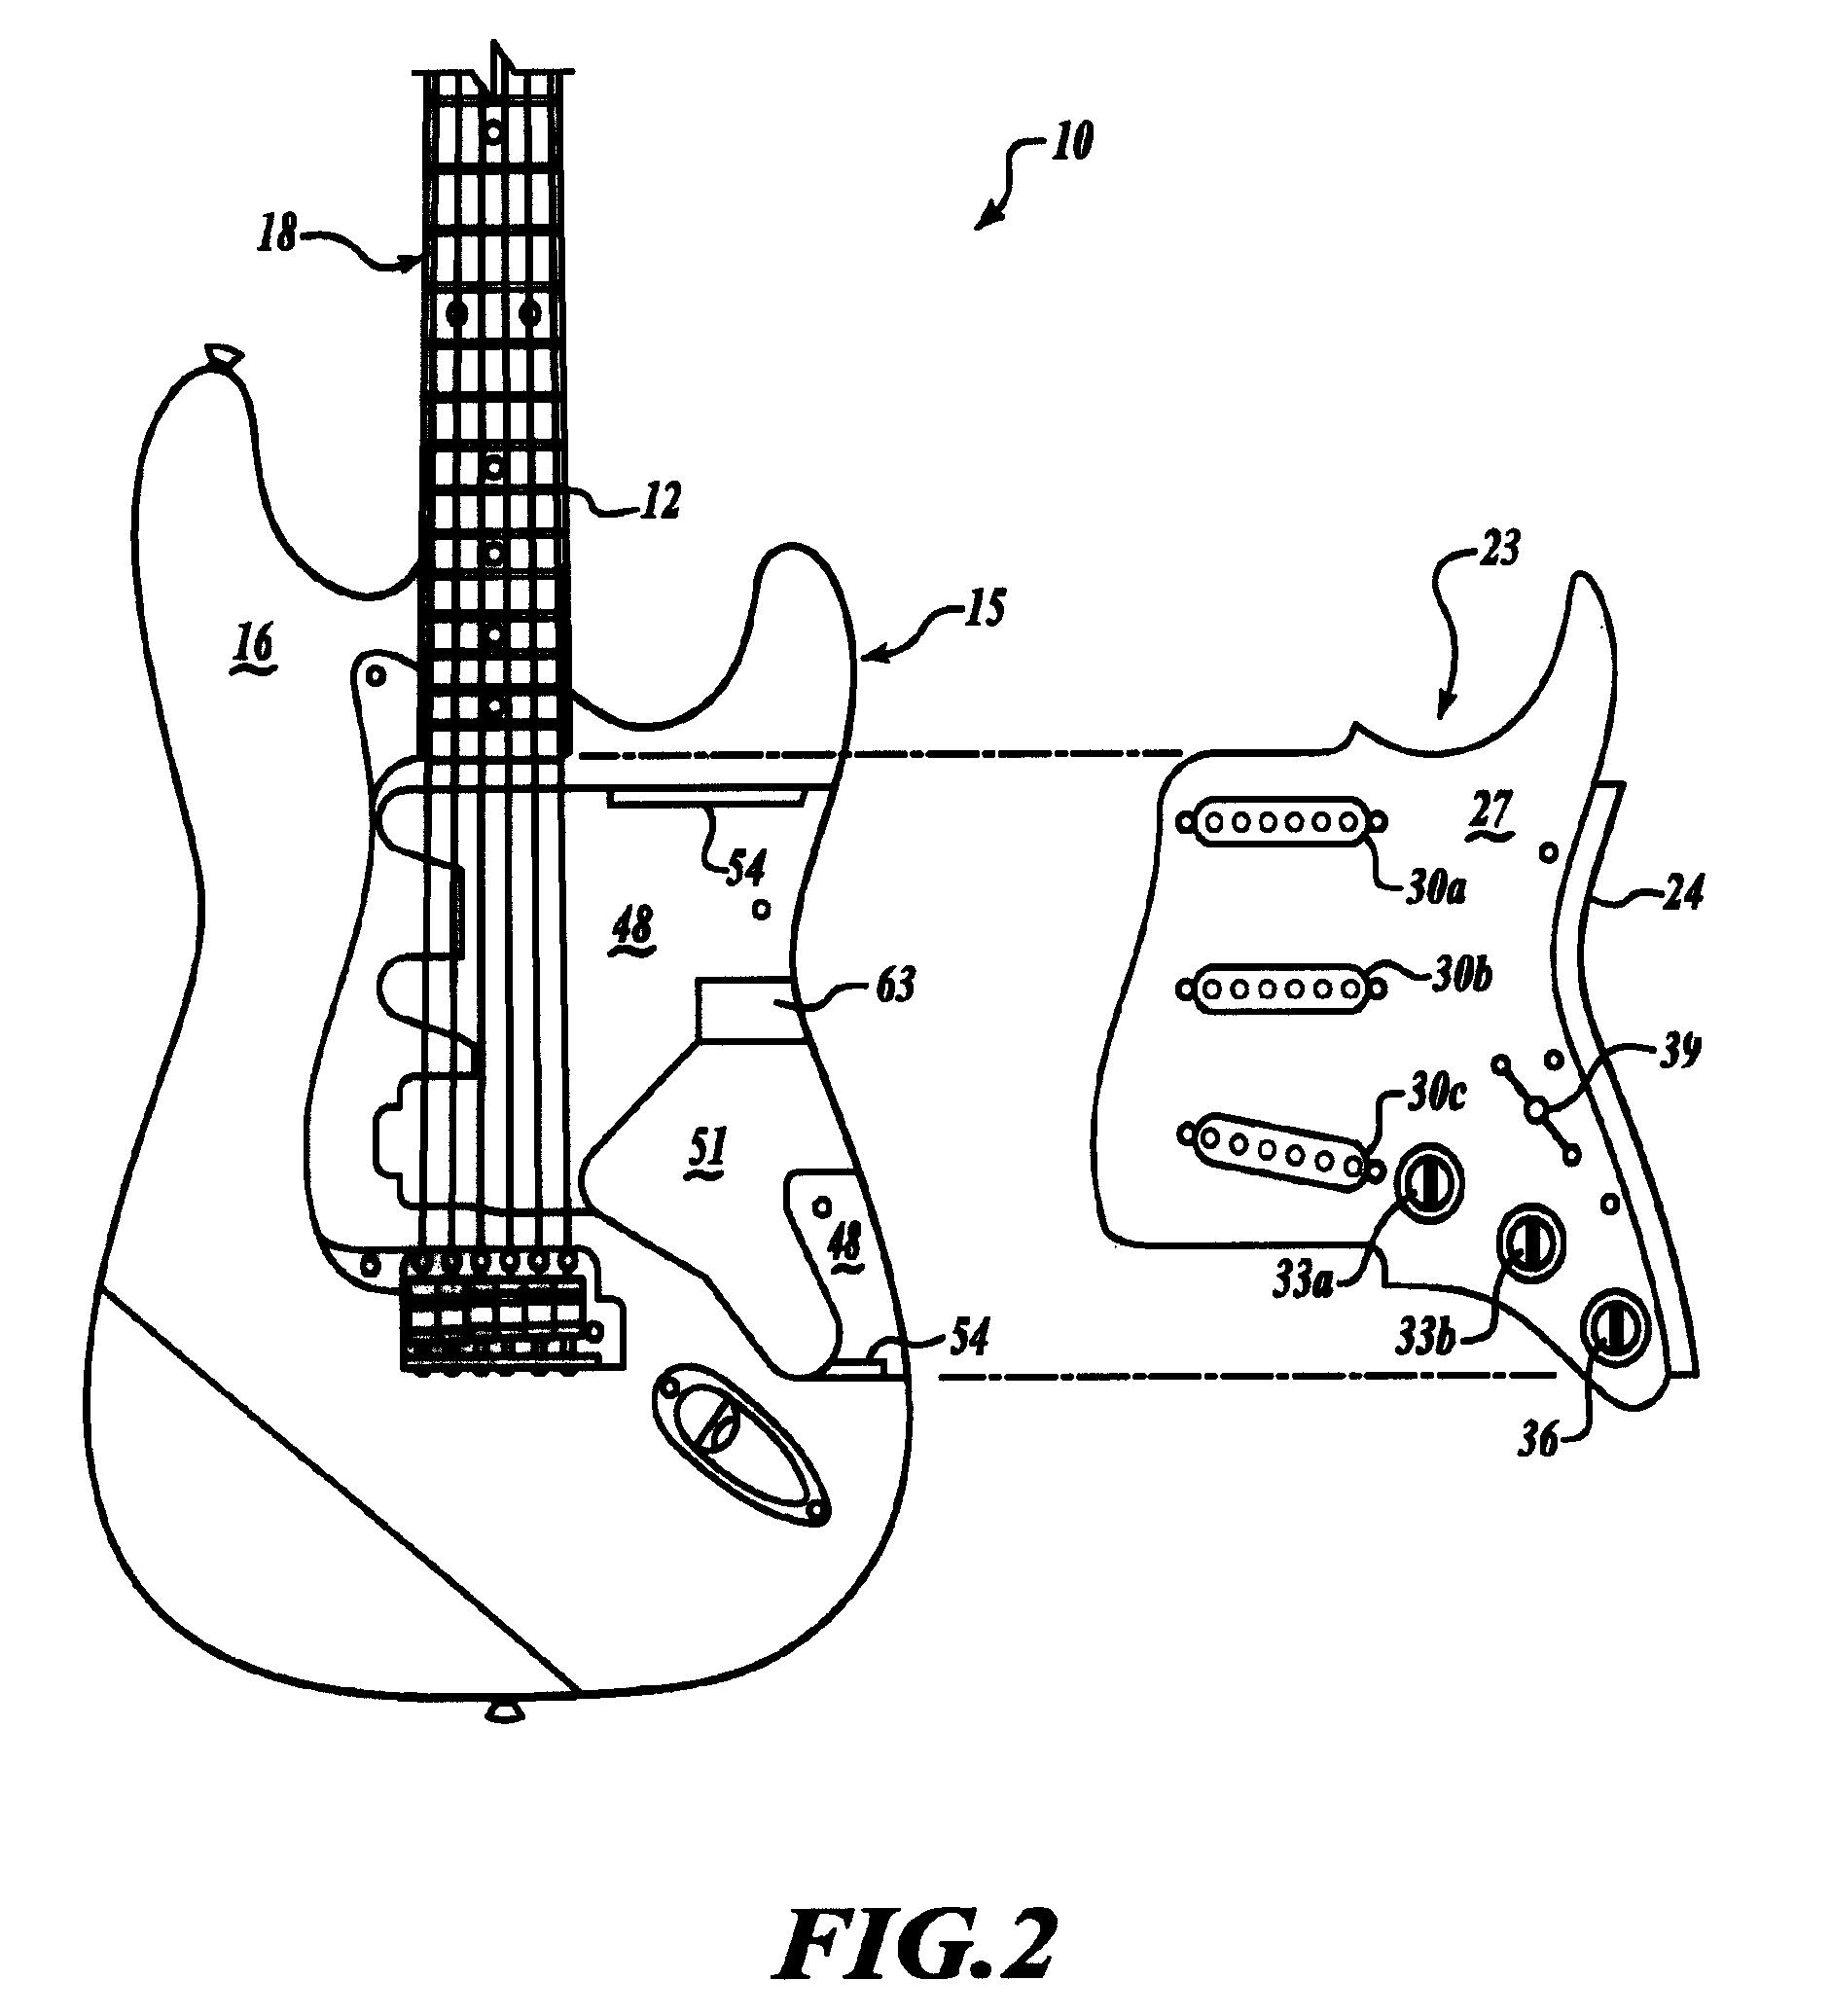 peavey b pickup wiring diagram zz 5822  guitar wiring soldering tips also with peavey predator  zz 5822  guitar wiring soldering tips